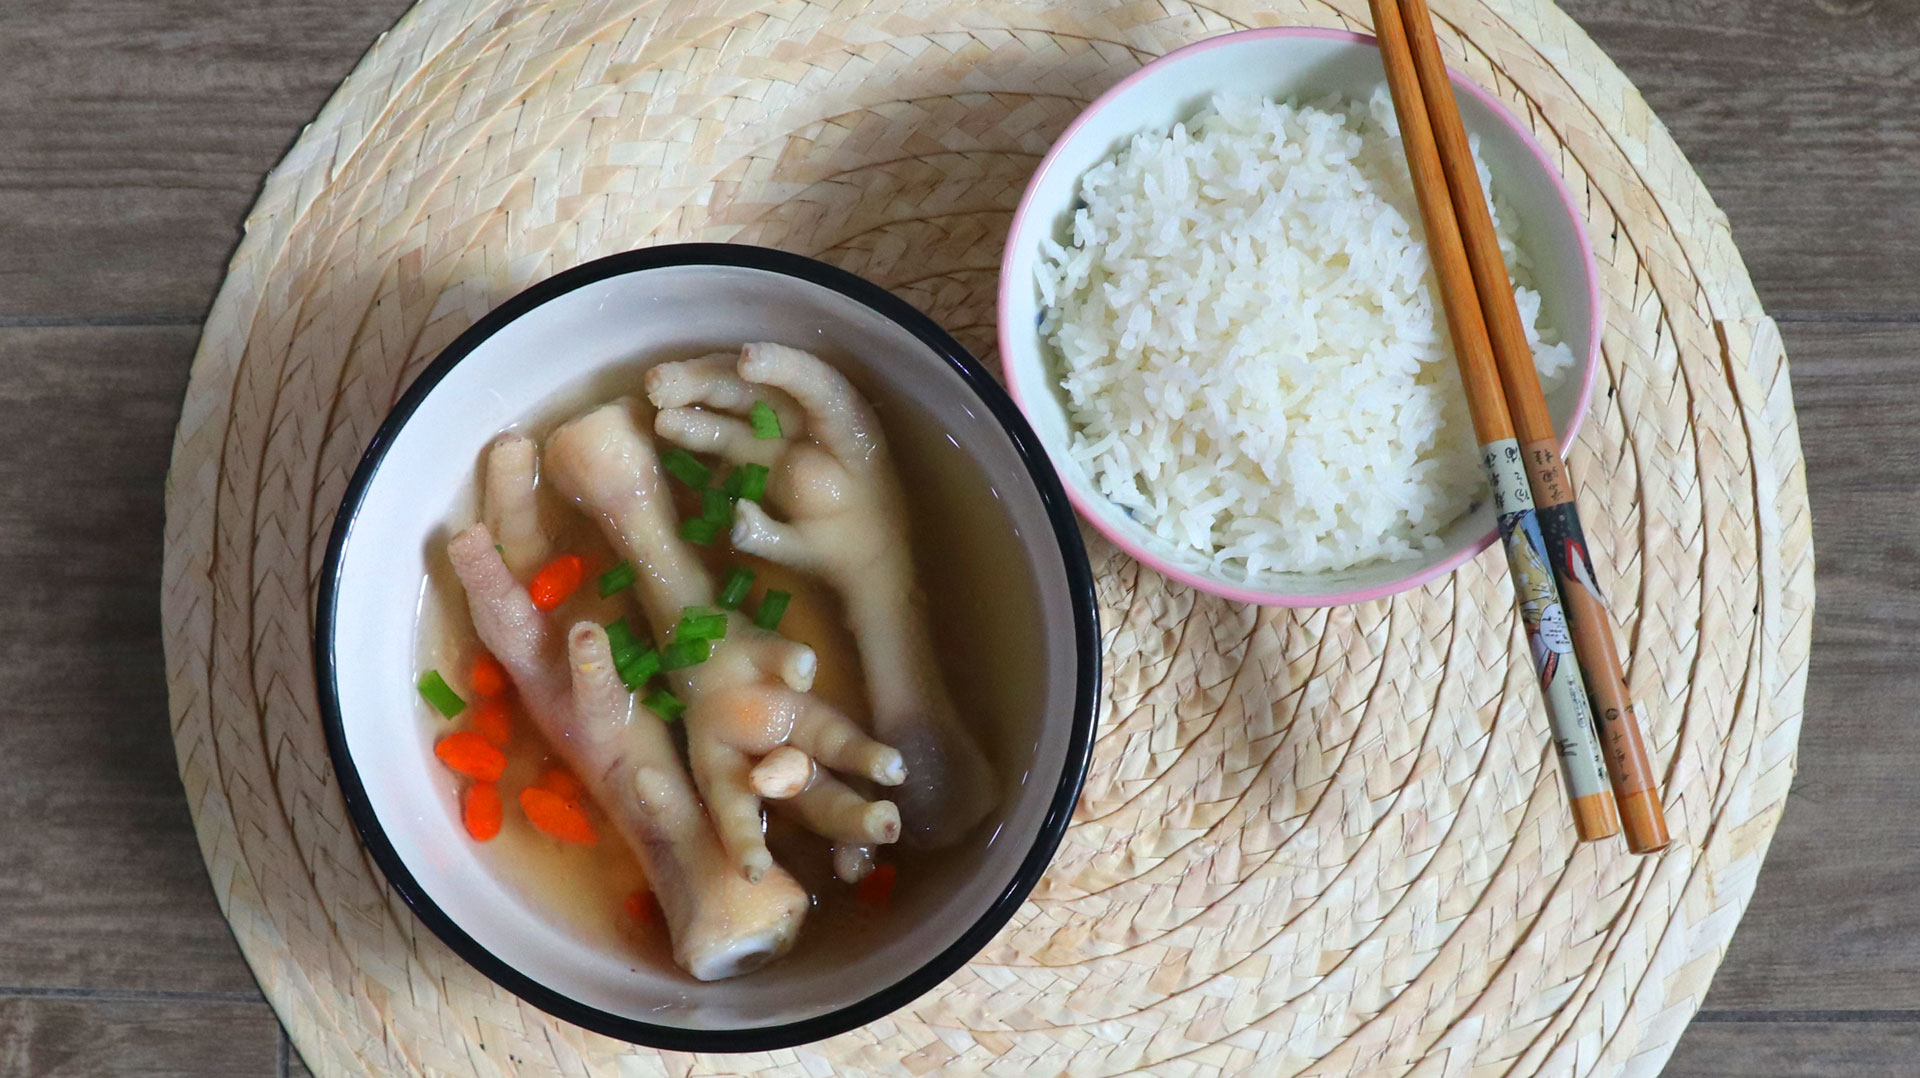 two-bad-chefs-chicken-feet-soup-dish-04.jpg